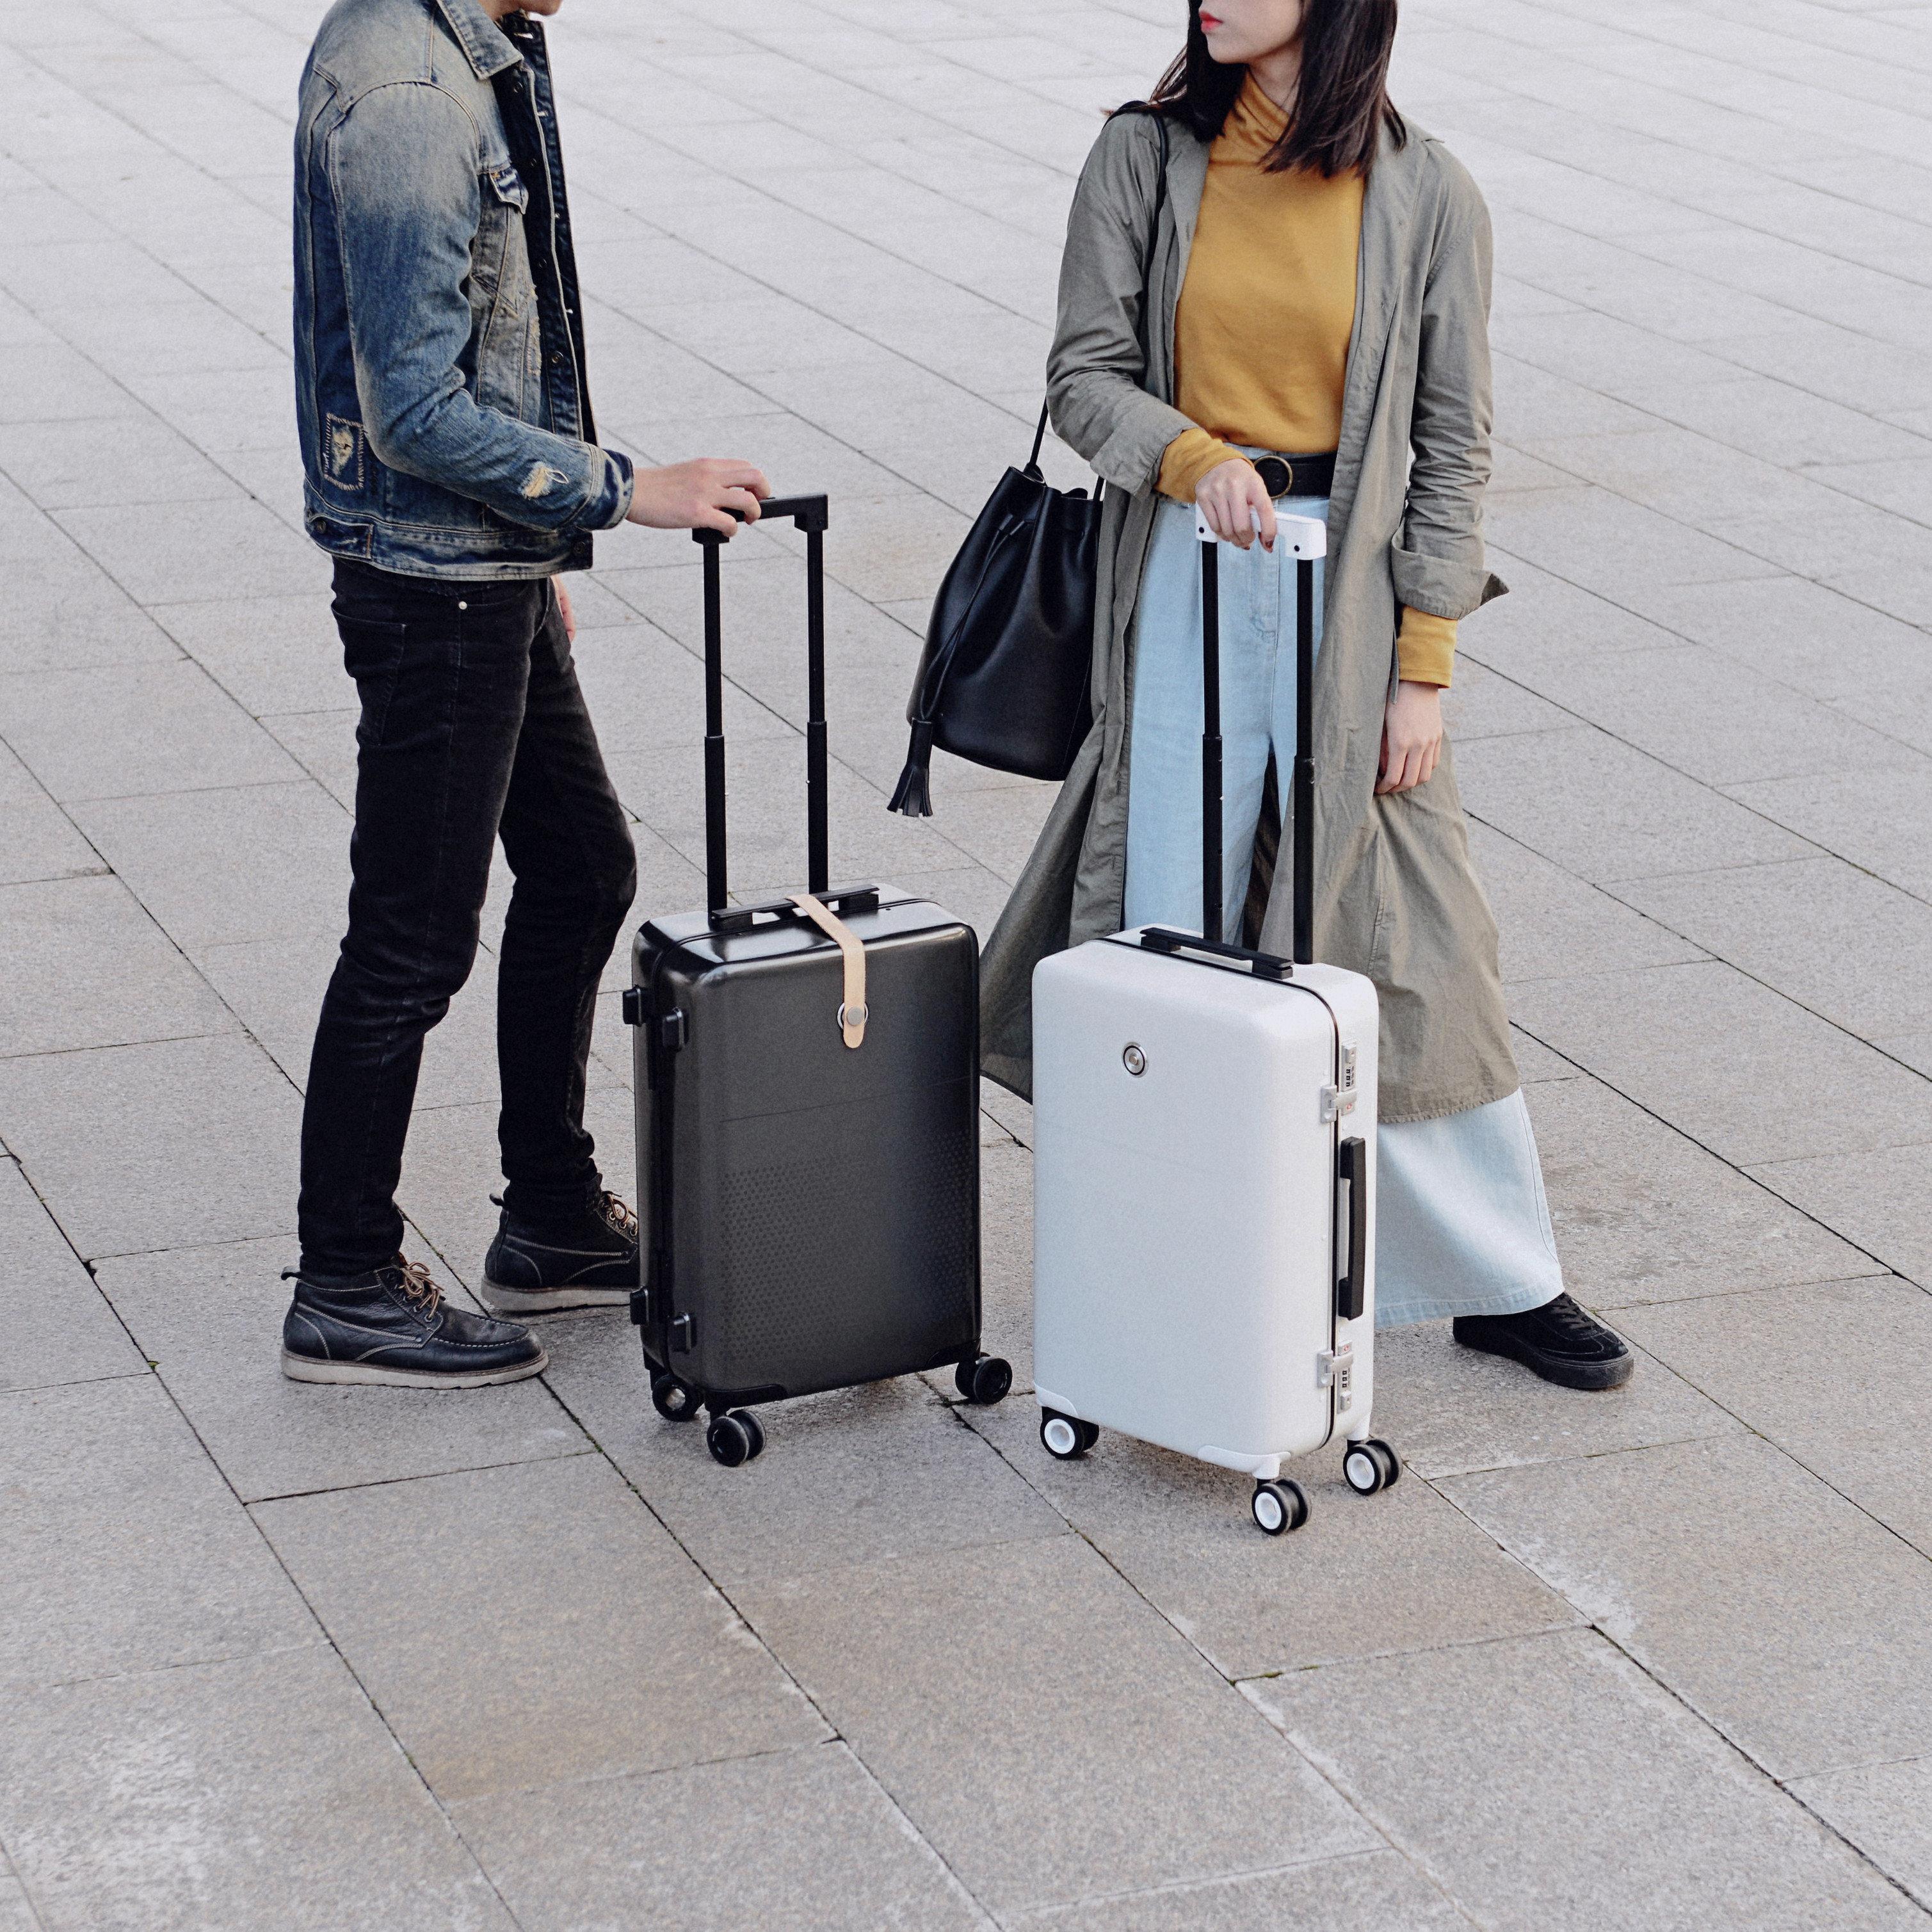 Celebs Style + Design Travel Shop ground outdoor person standing suitcase sidewalk way flooring